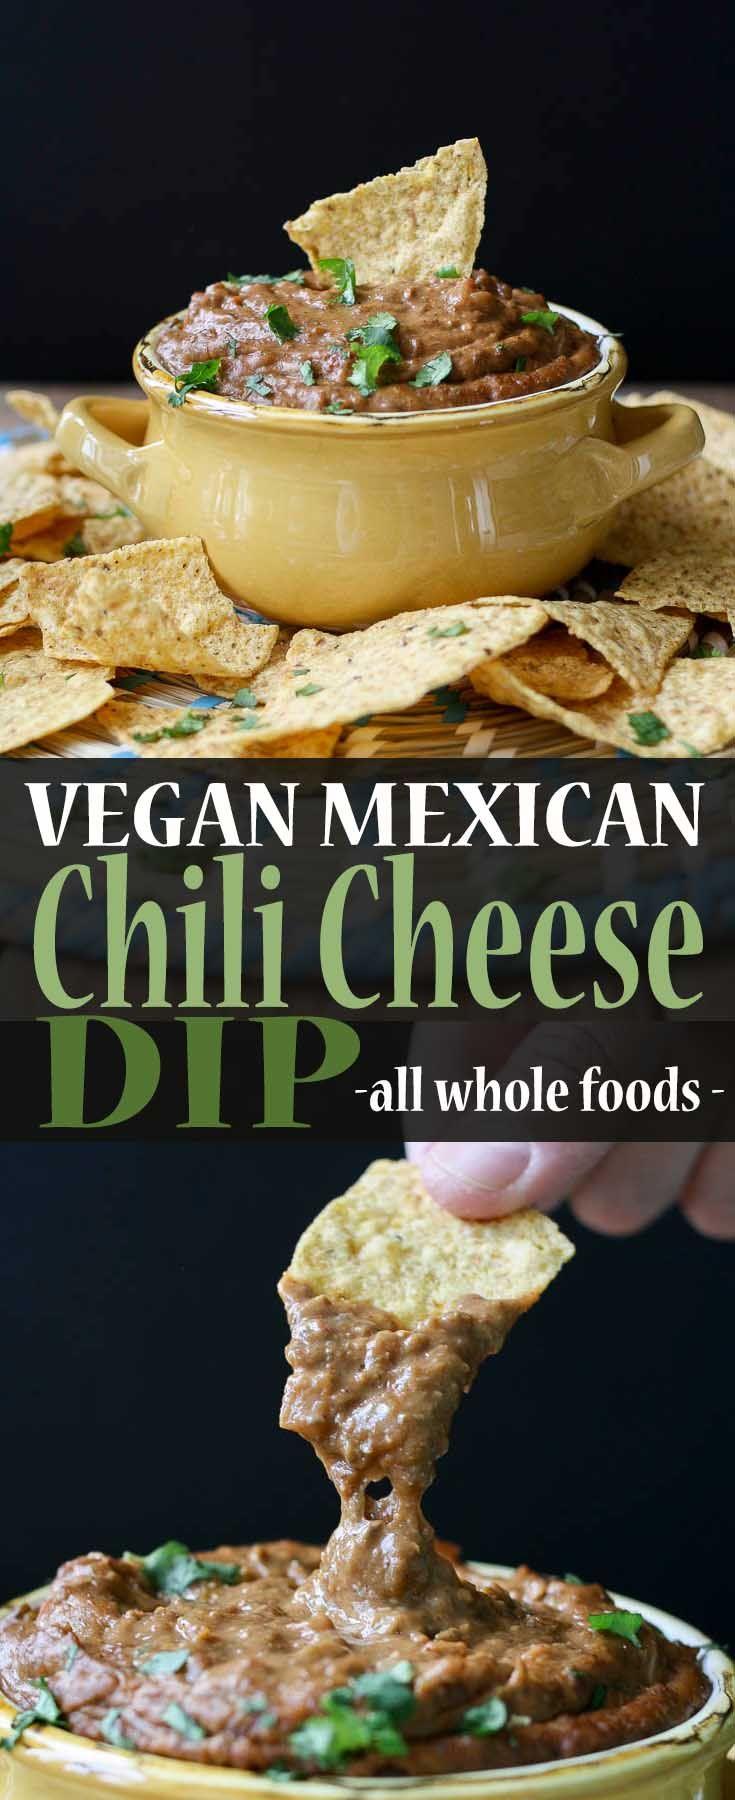 Vegan Mexican Chili Cheese Dip | www.veggiesdontbite.com | #vegan #plantbased #wholefoods #mexican #superbowl via @veggiesdontbite